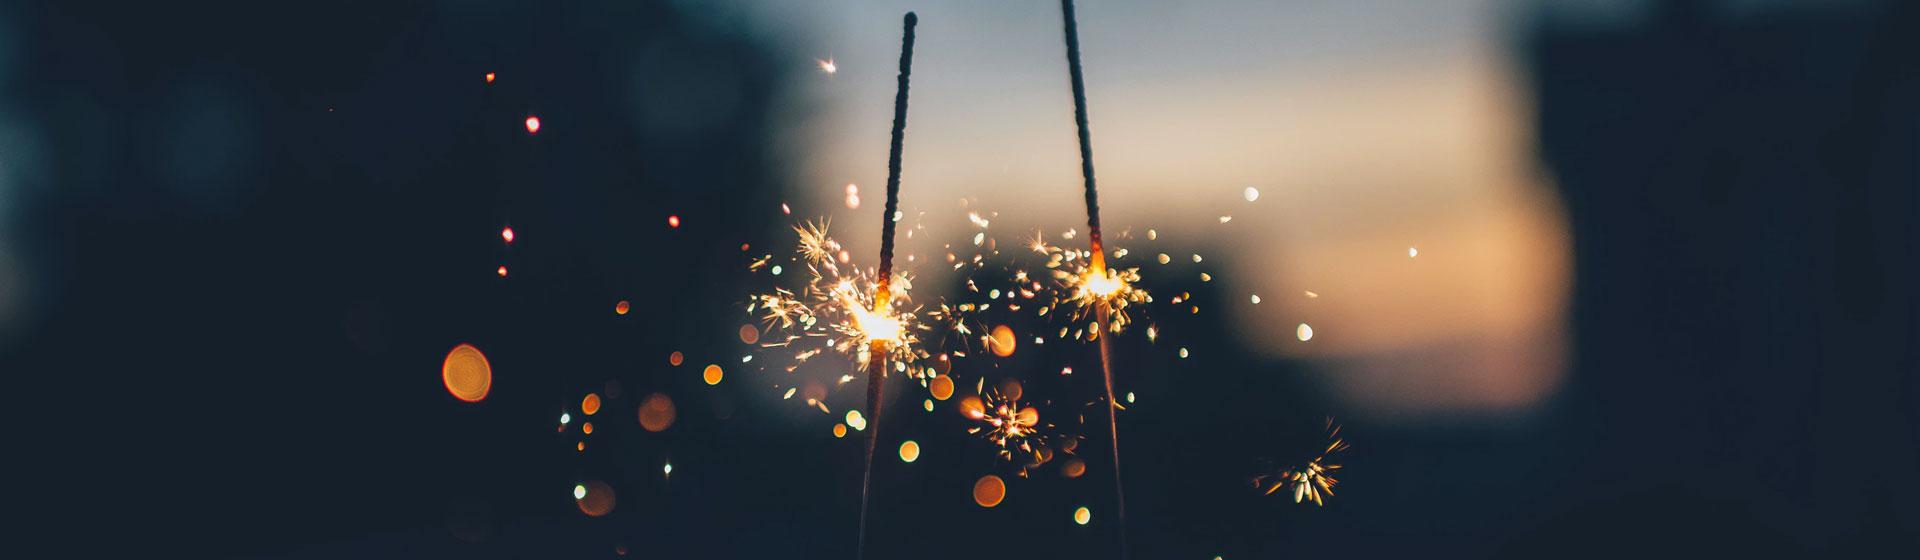 awu eventa net – Sonstige Feiern